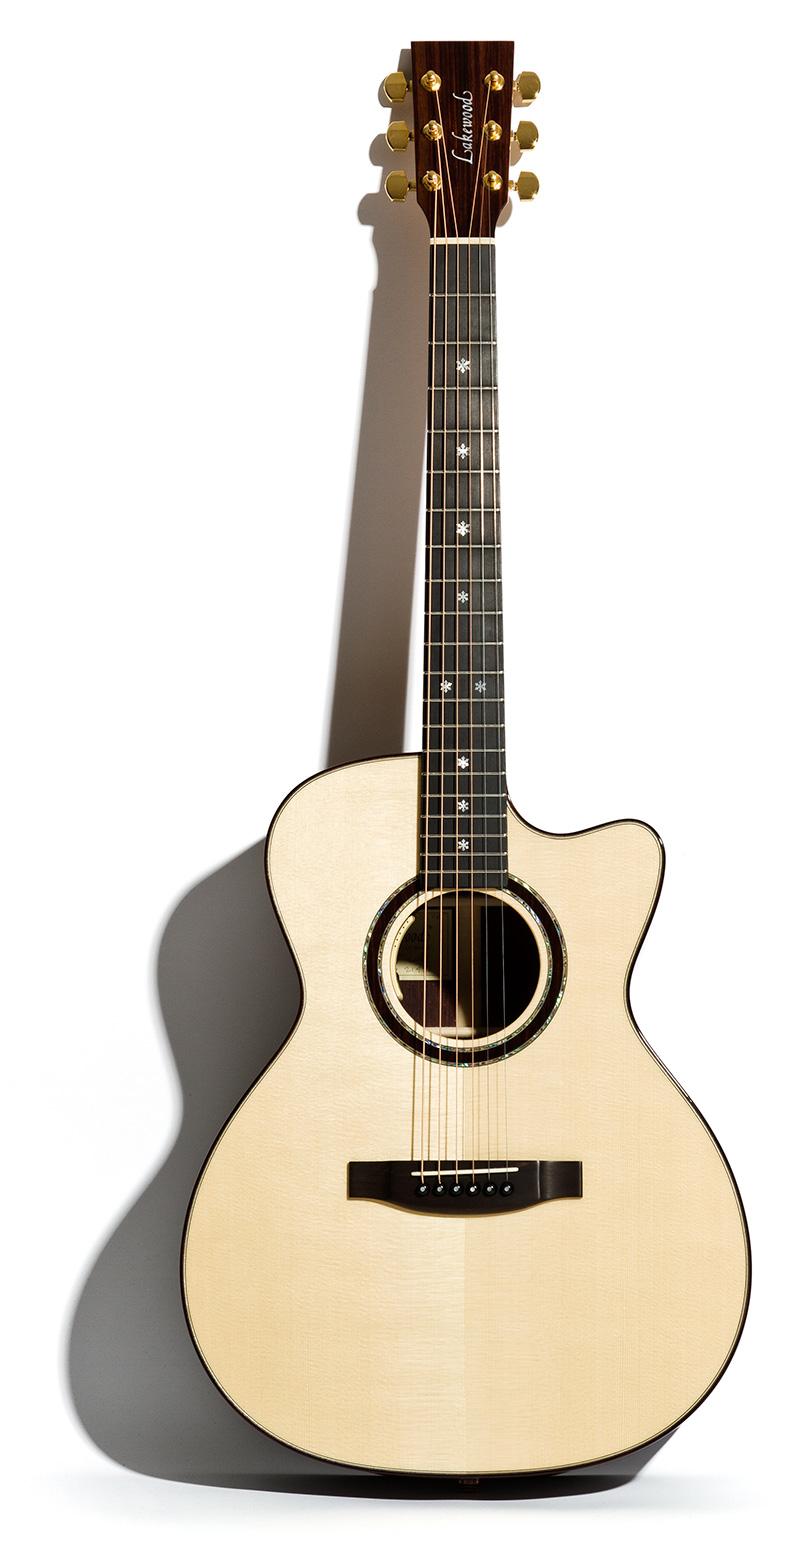 lakewood m 32 cp grand concert deluxe serie elektro akustik gitarre inkl koffer natural. Black Bedroom Furniture Sets. Home Design Ideas